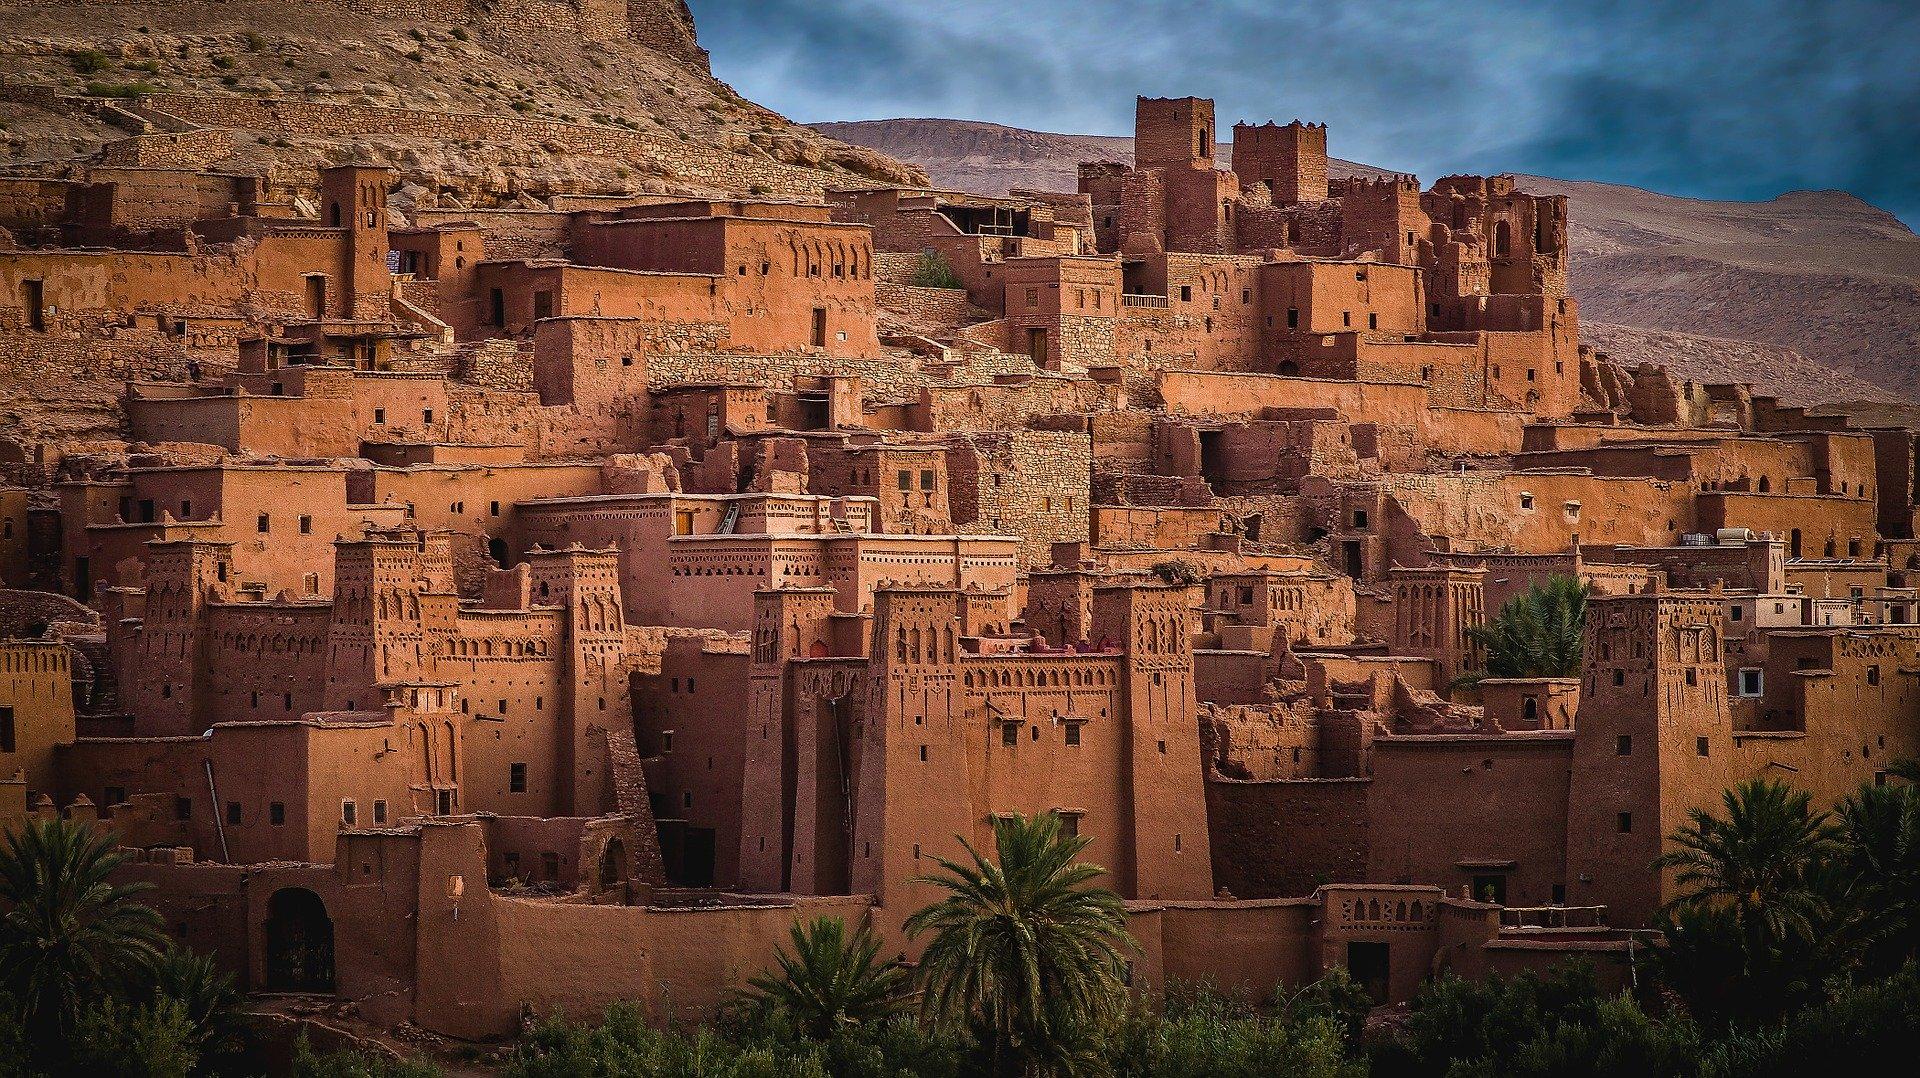 Temperature Marocco febbraio marzo: